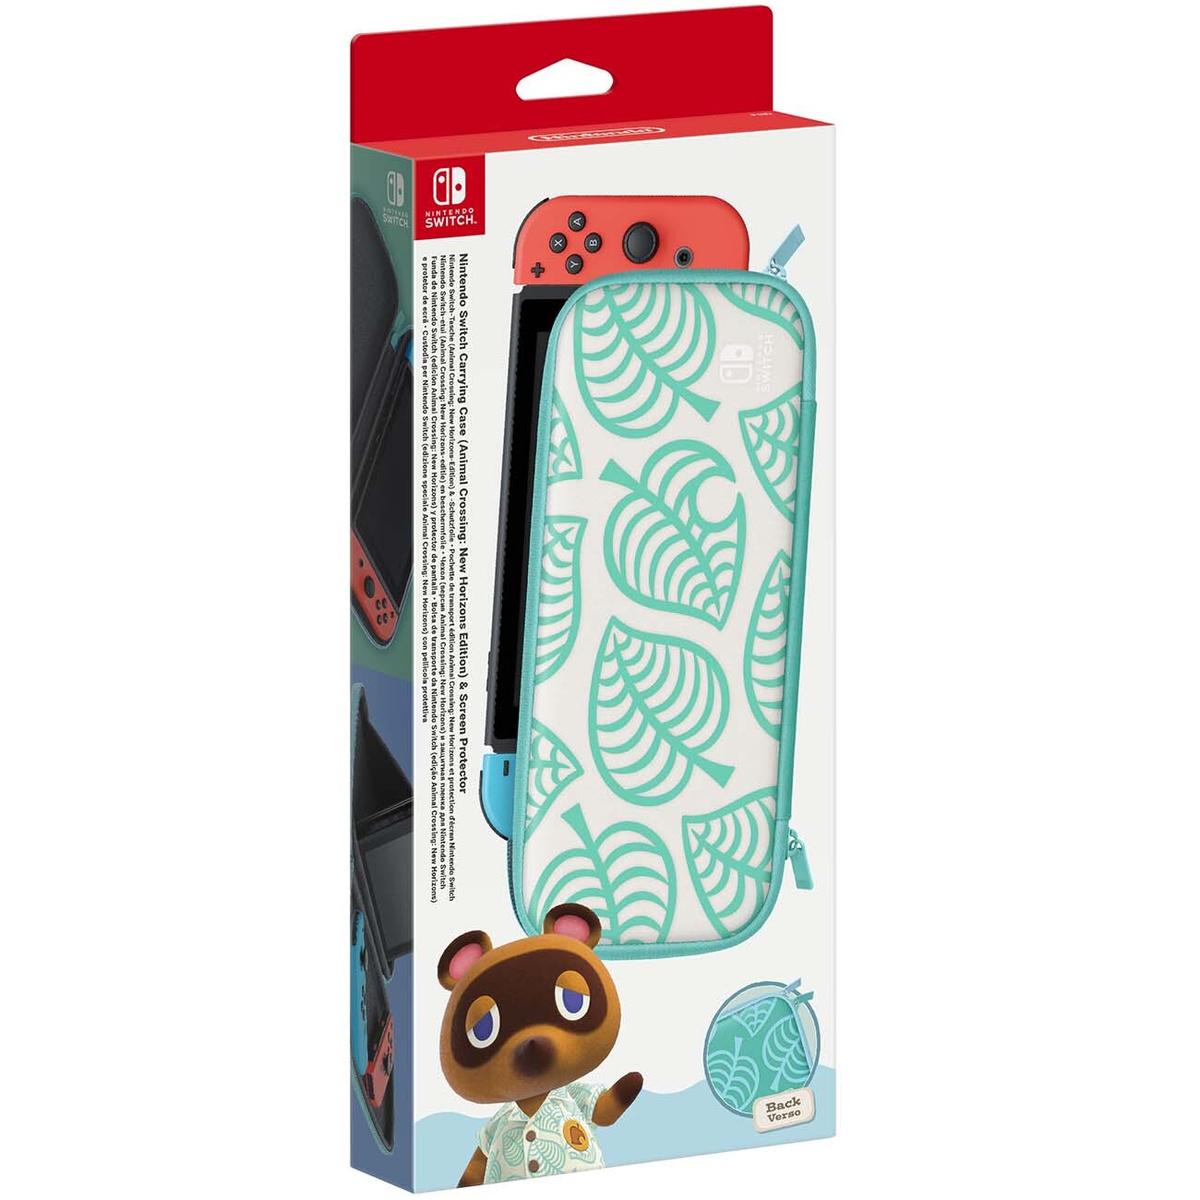 Nintendo Аксессуар для игровой приставки Чехол и пленка Animal Crossing New Horizons  #1